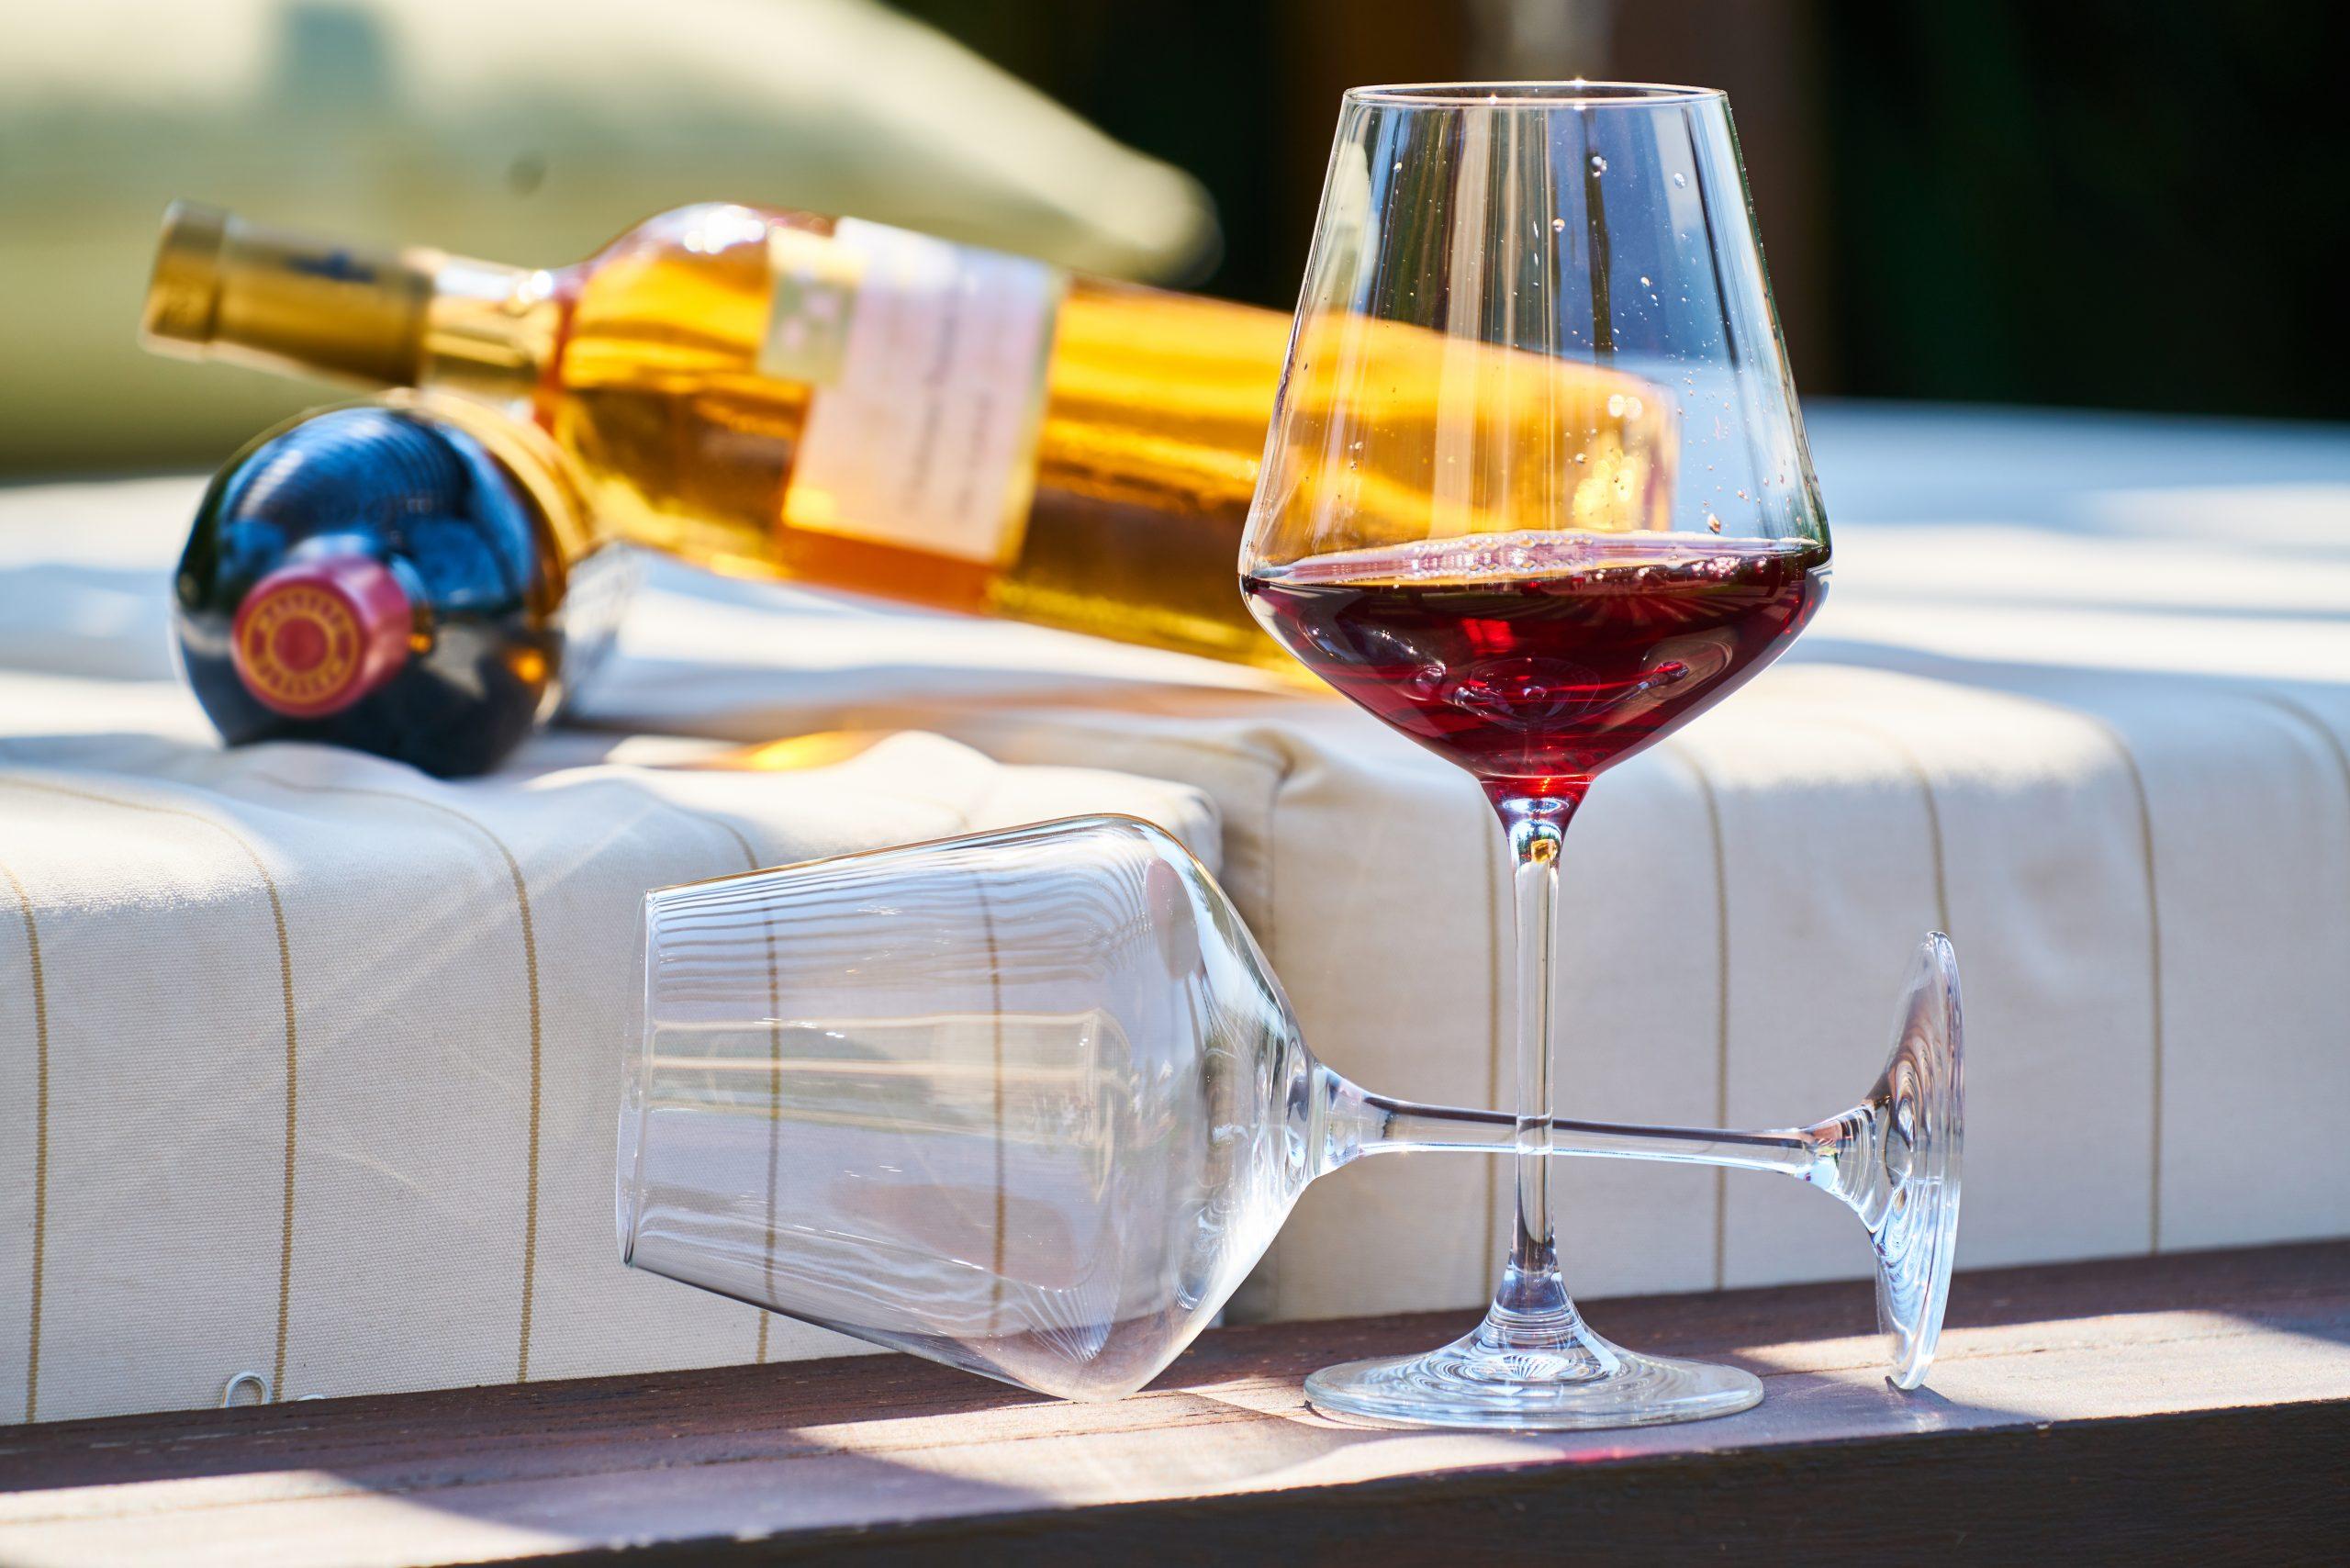 Wijn El Placer - De Pionier